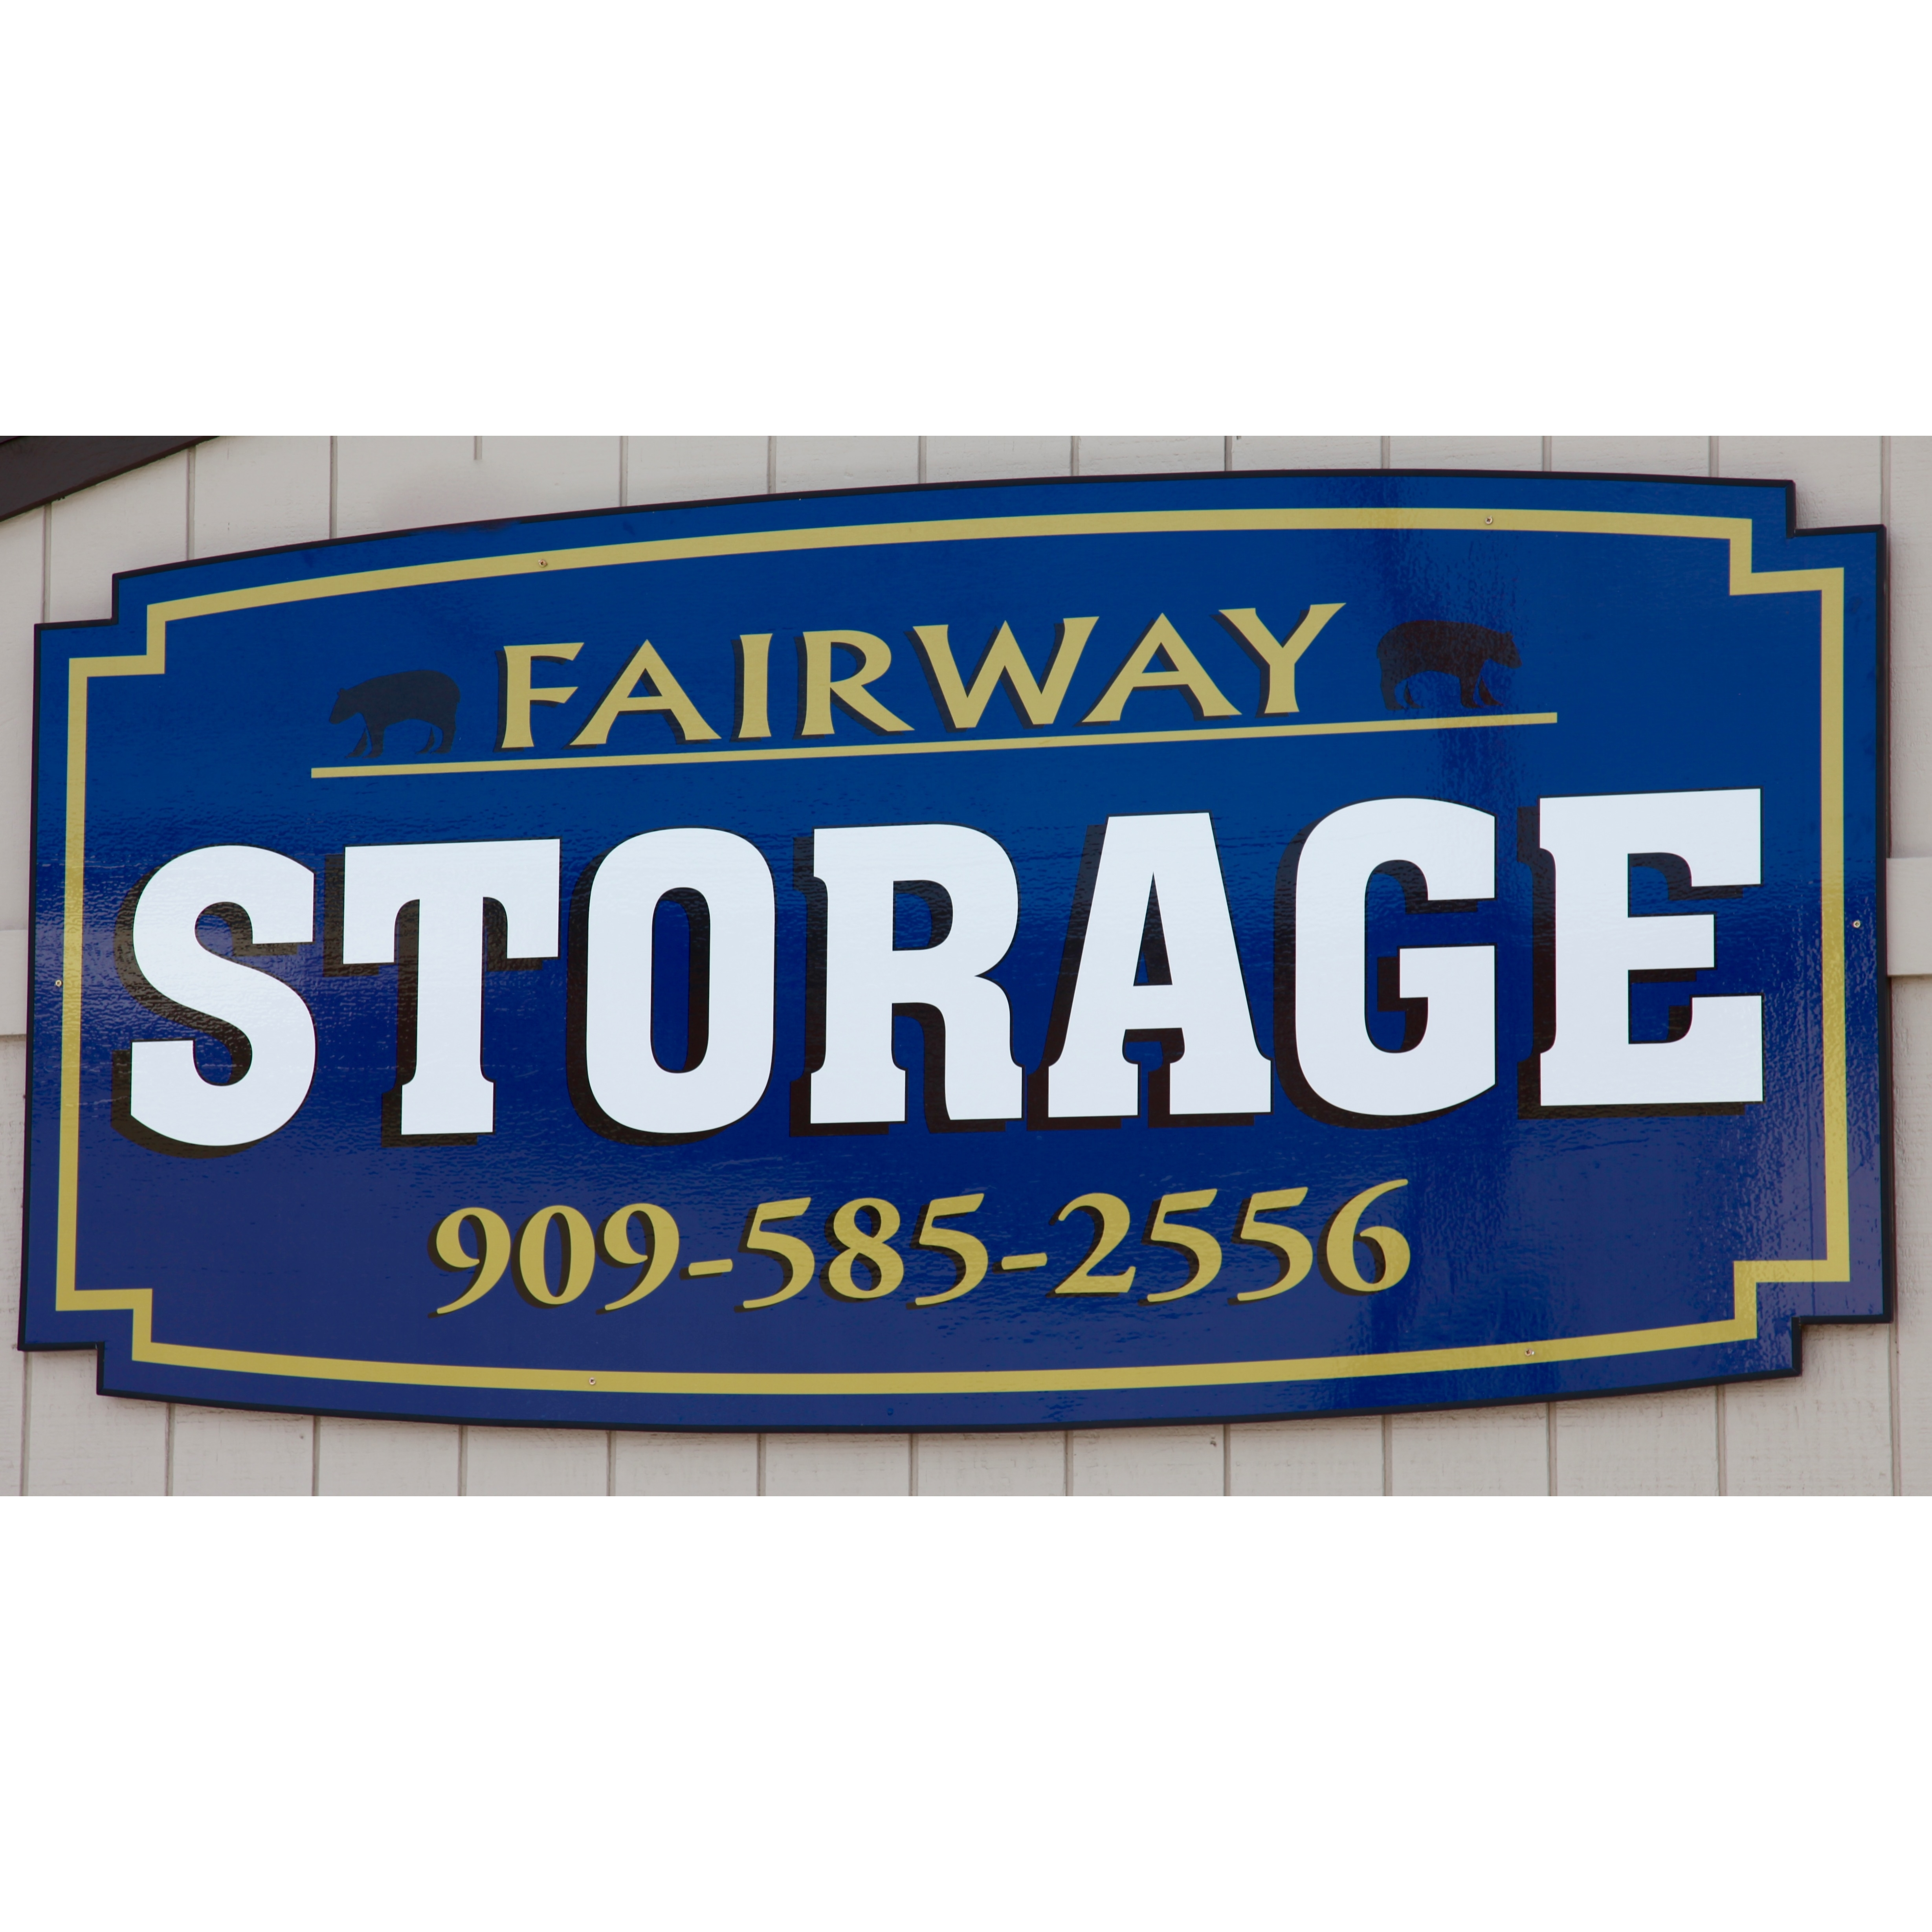 Fairway storage big bear big bear city ca business for California company directory